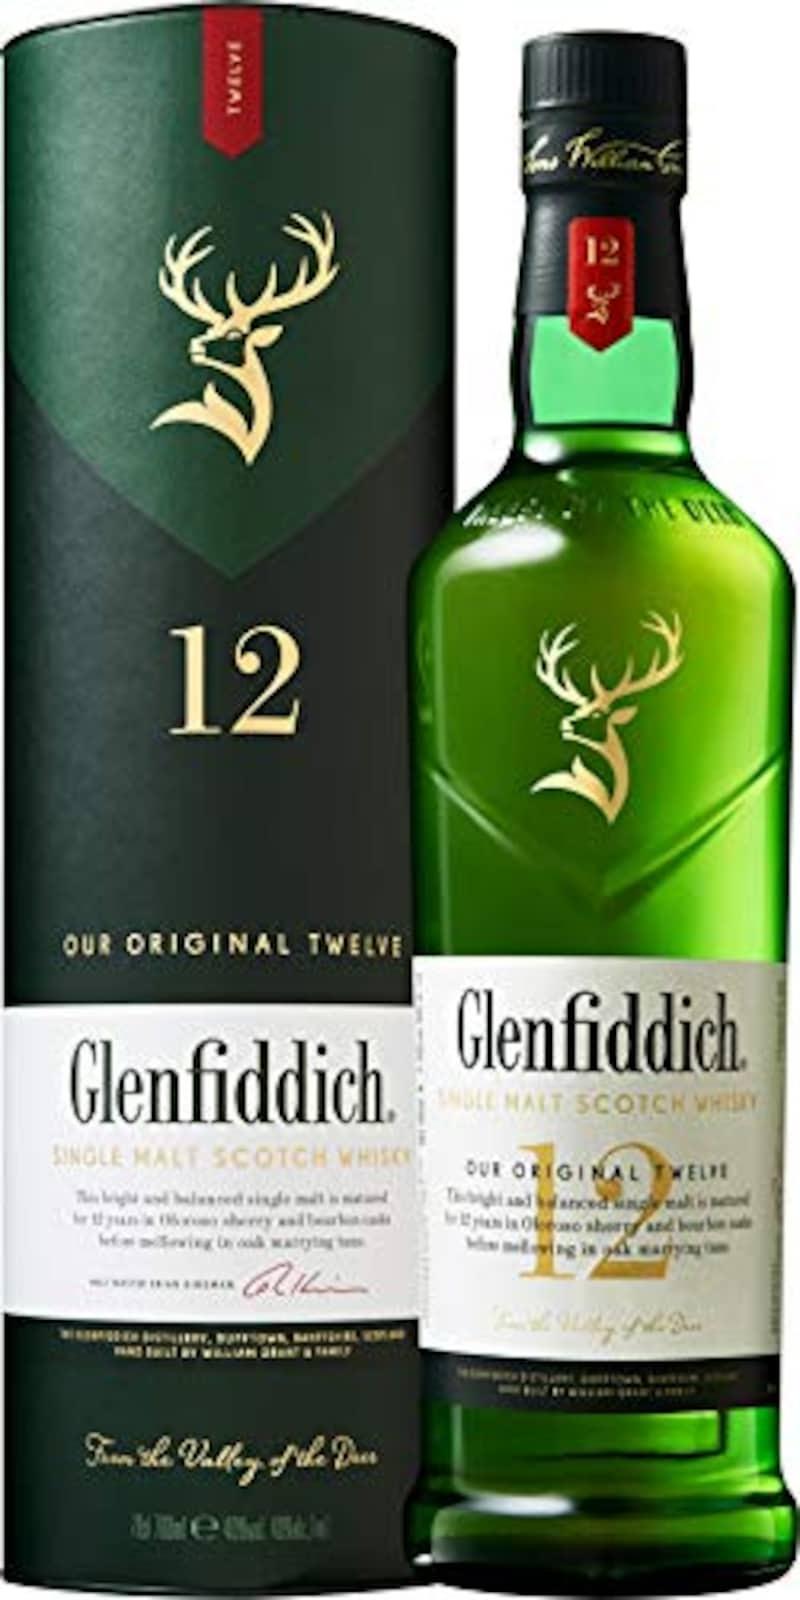 Glenfiddich(グレンフィディック),グレンフィディック 12年 スペシャルリザーブ